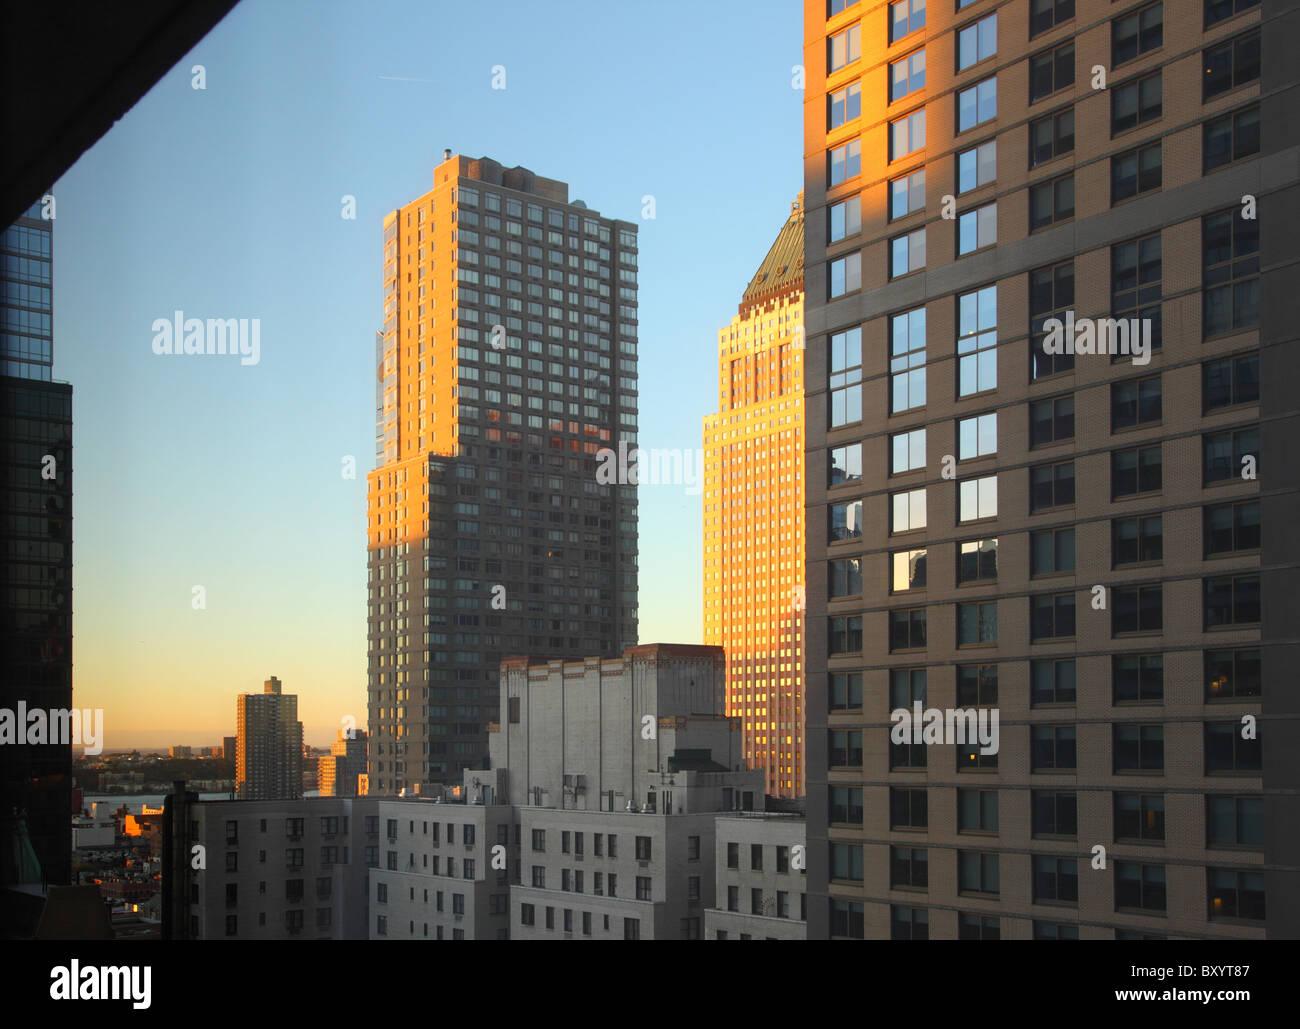 Sky Scraper, Times Square, Manhattan, New York City Stockbild